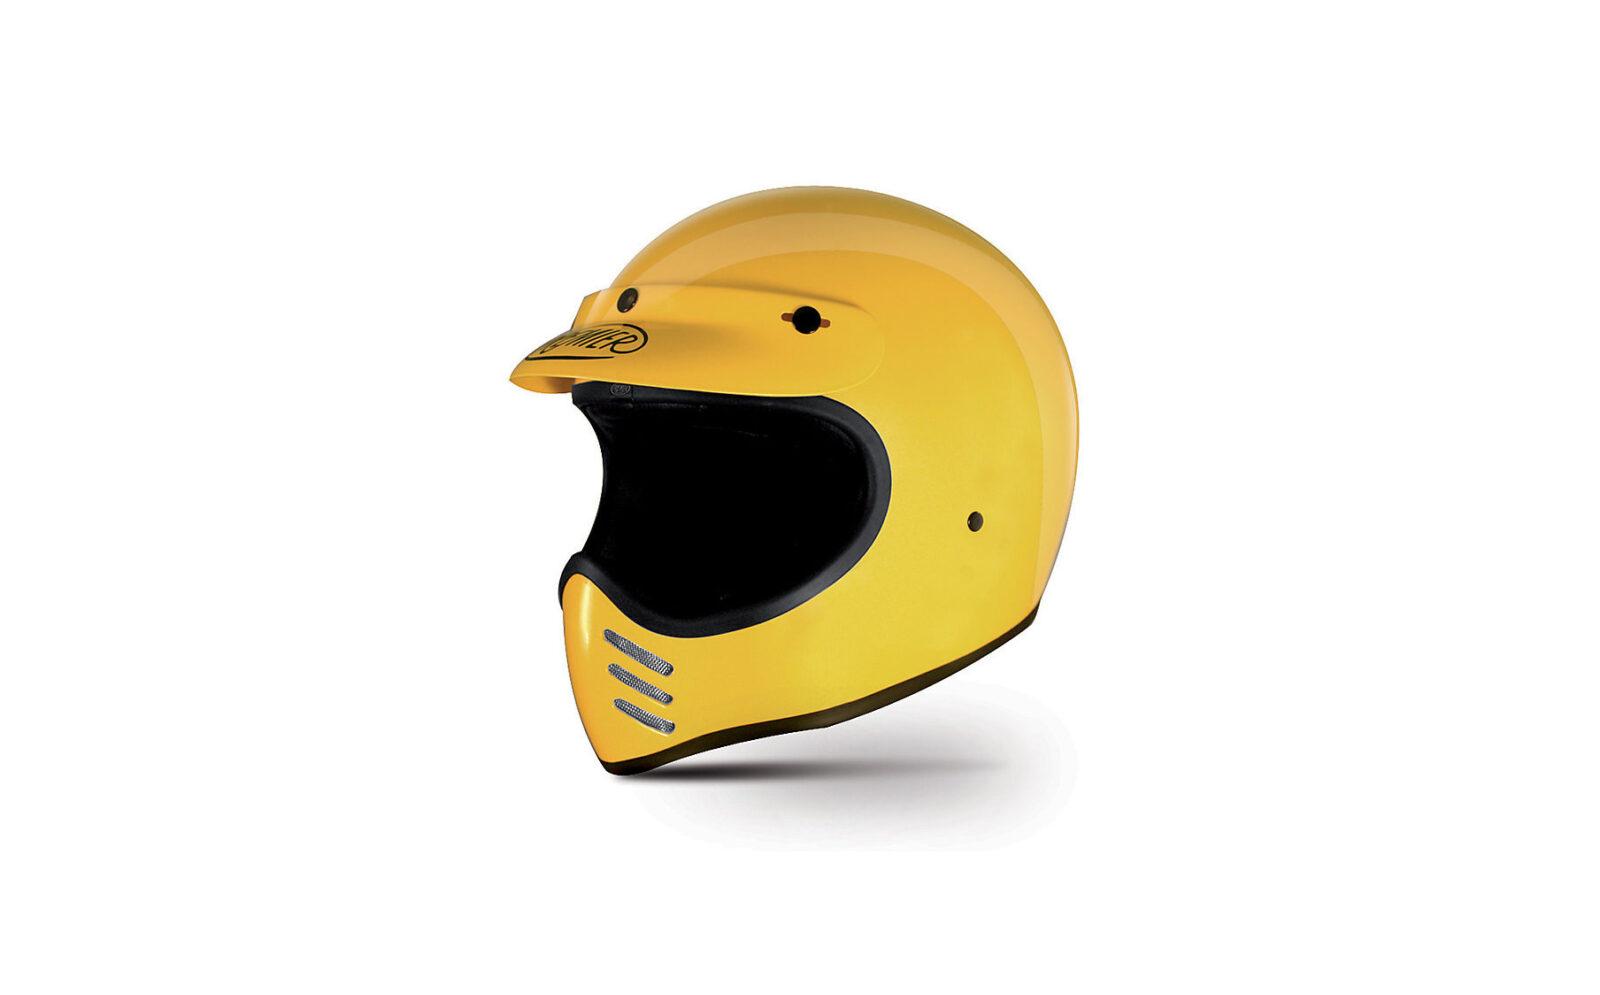 Premier Trophy MX Helmet 1600x995 - Premier Trophy MX Helmet